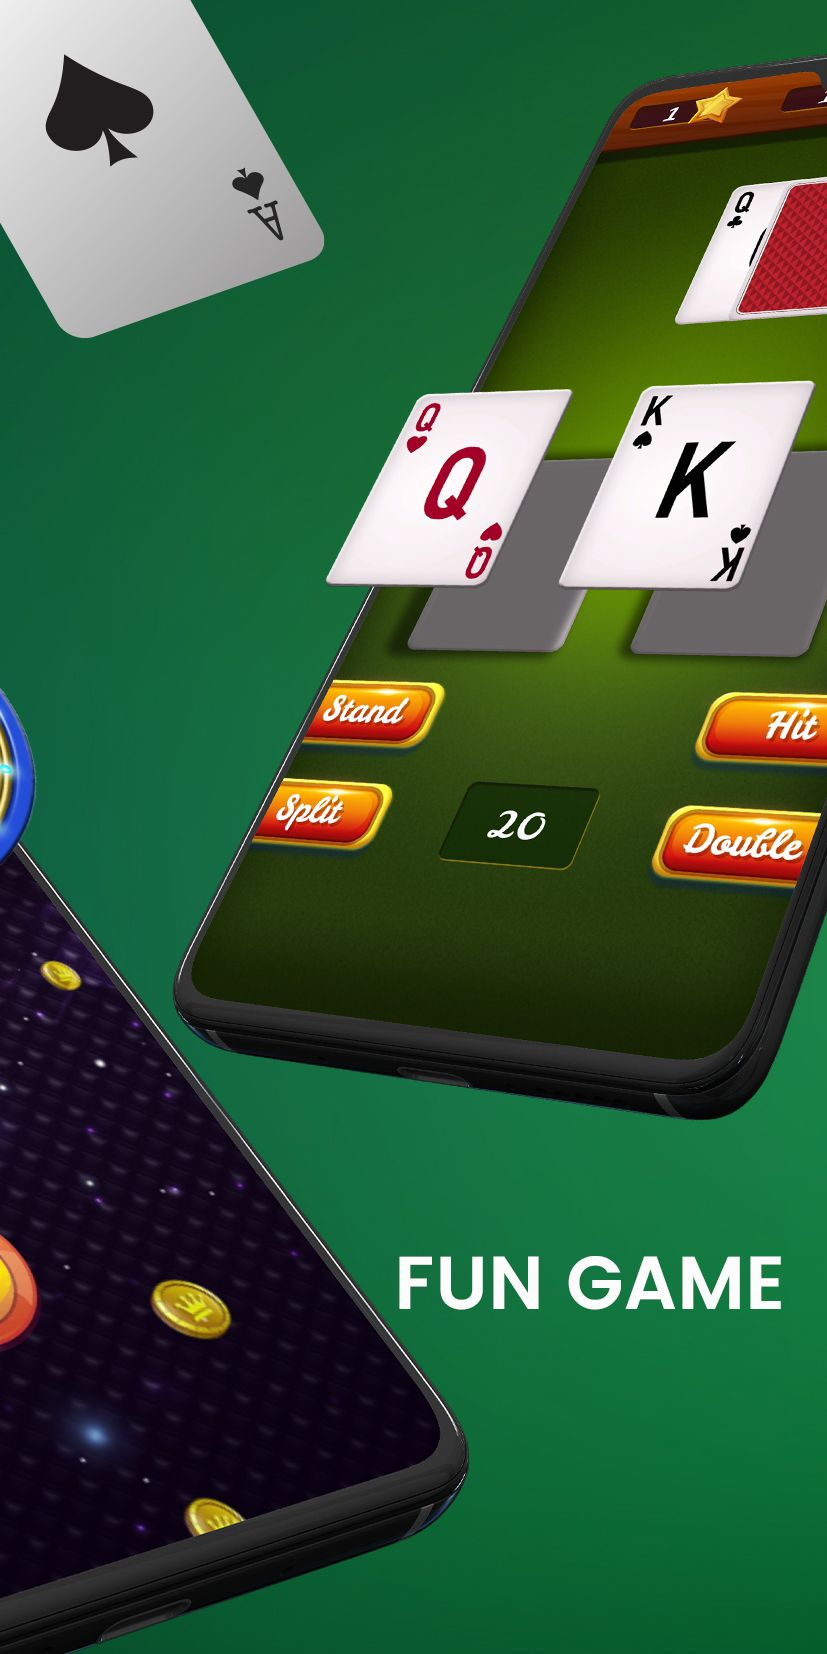 Blackjack 21 casino card game in 2020 casino card game